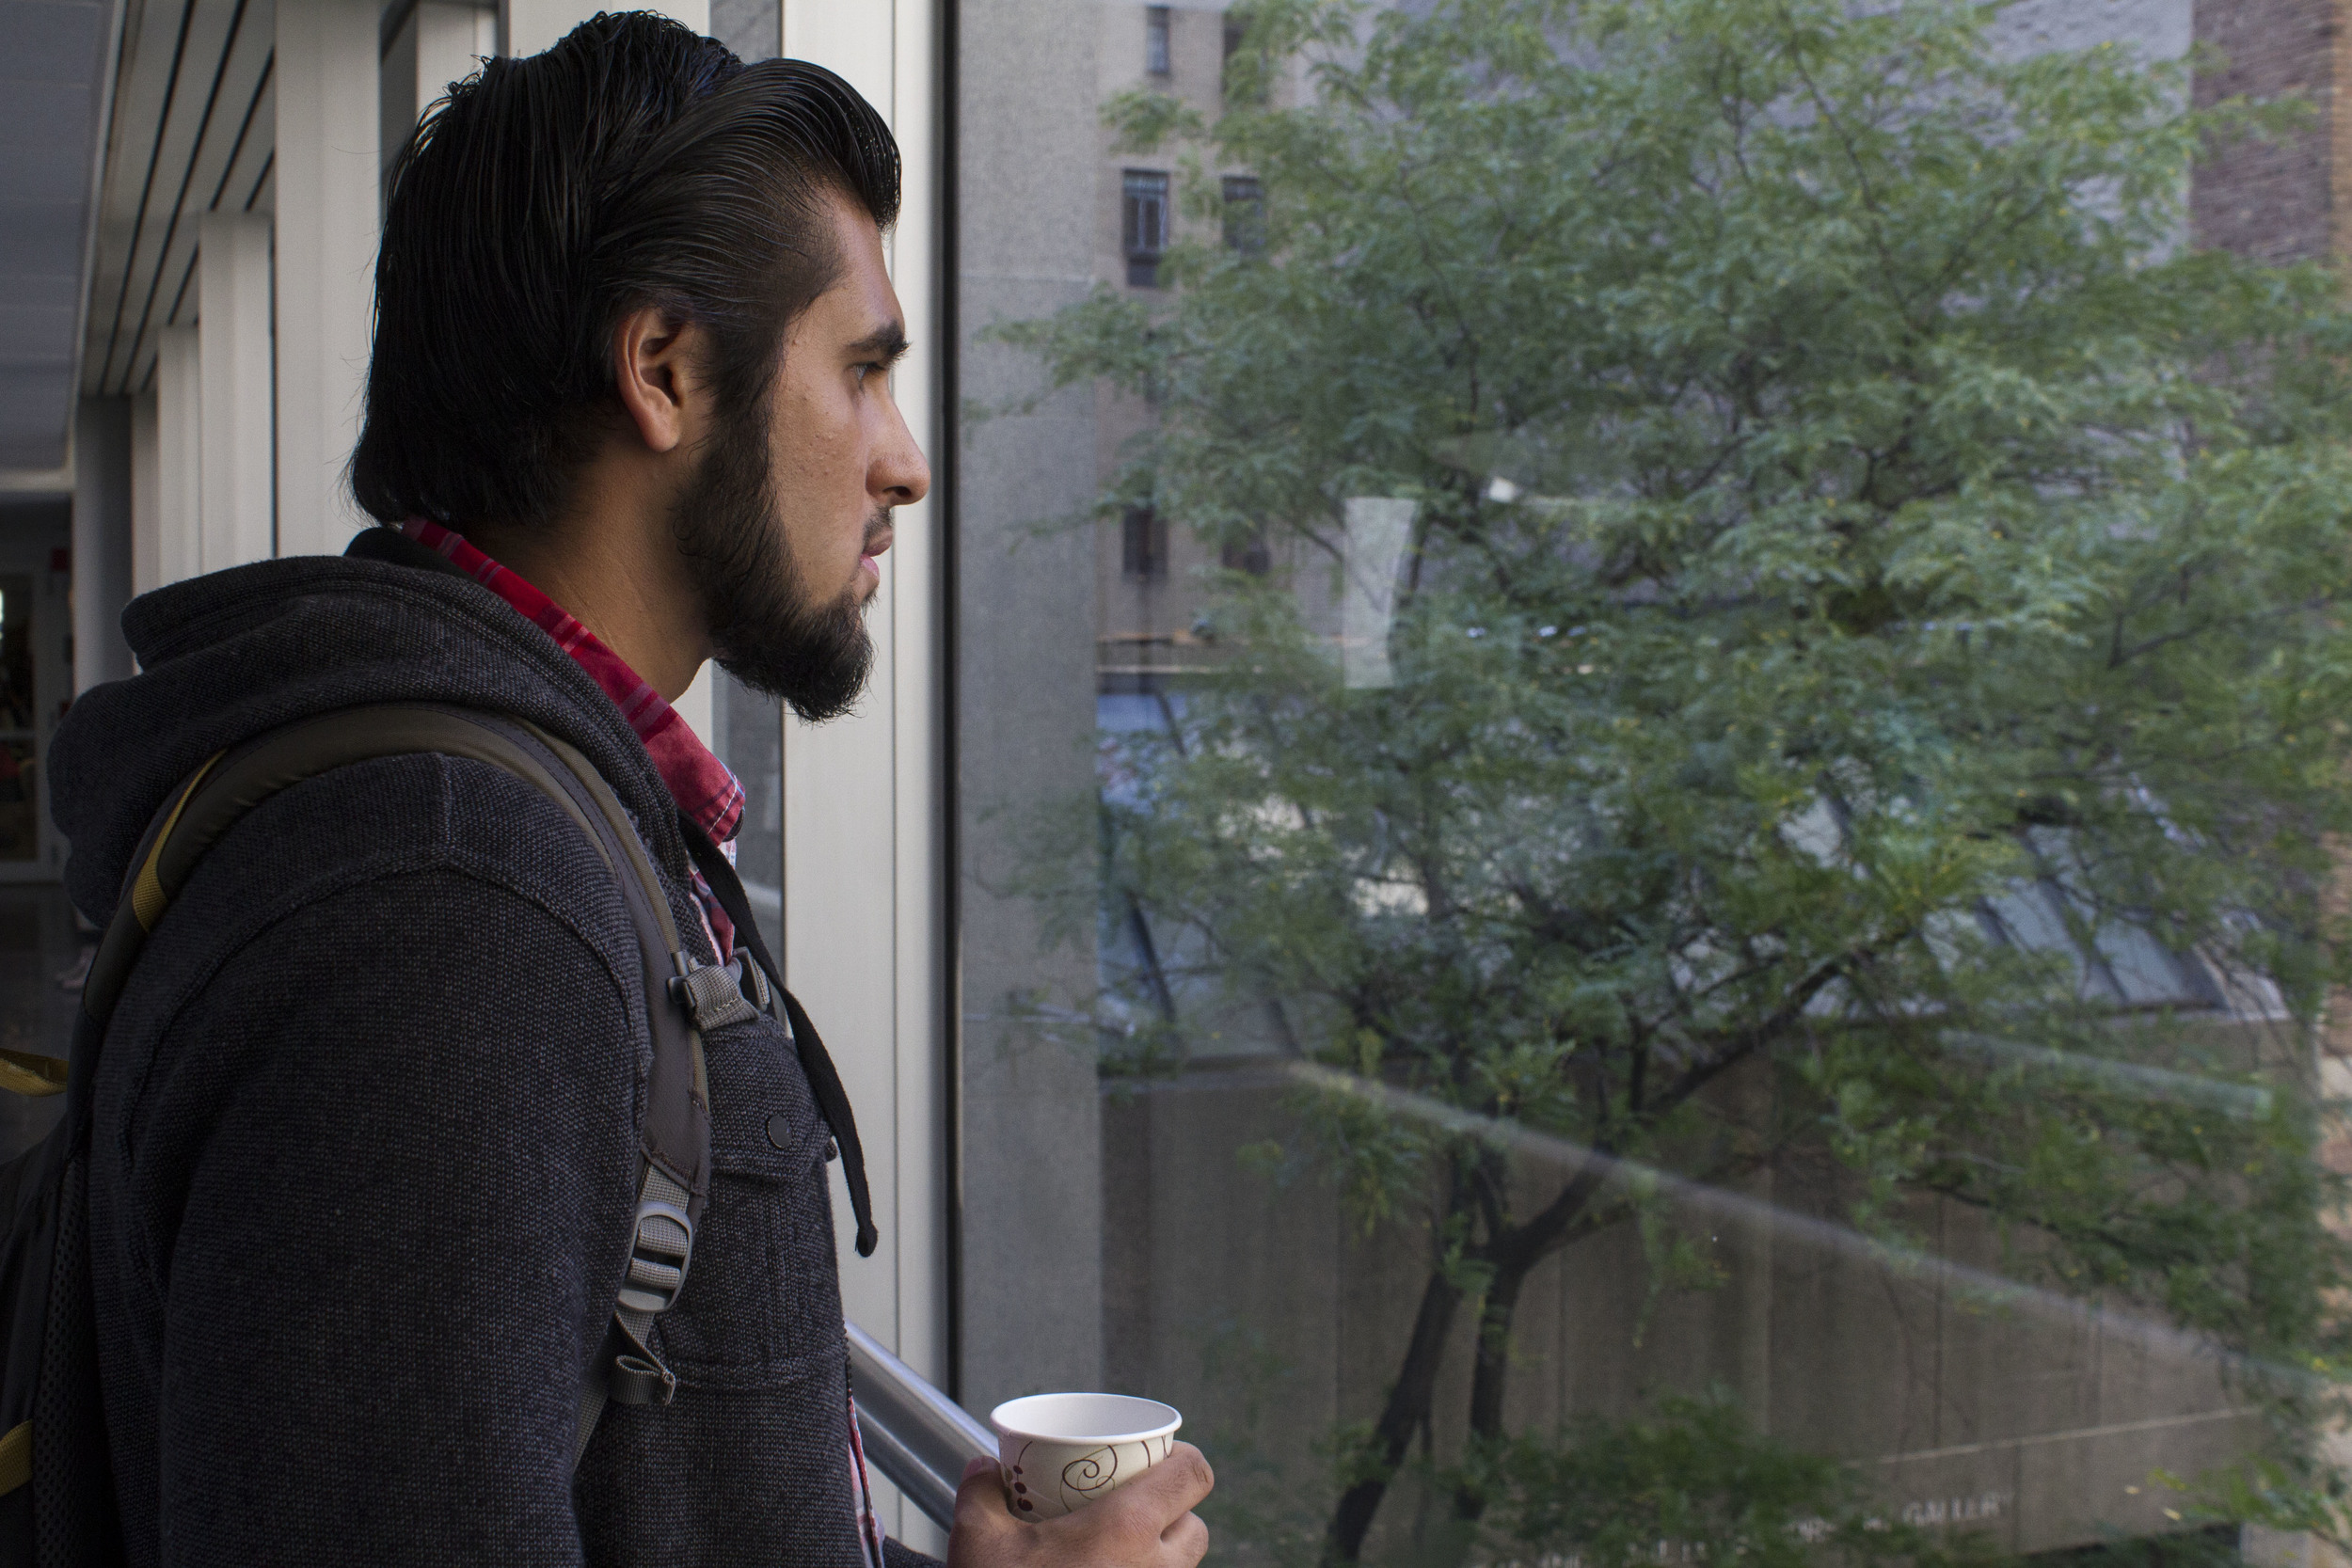 Navel Shah, 19, at Hunter College in Manhattan, before prayers in the school's designated prayer space.